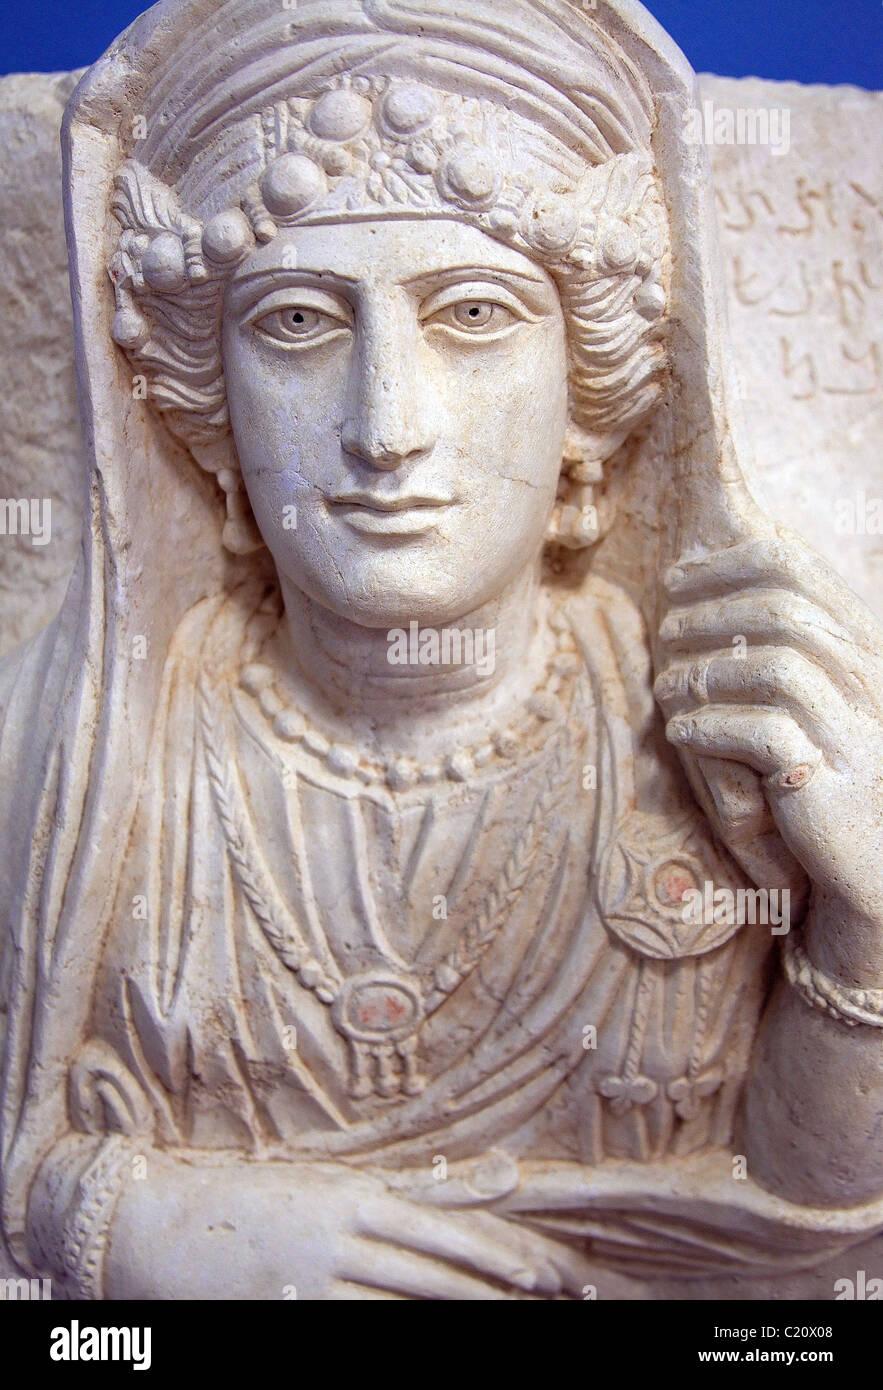 Palmyrene funerary portrait in Palmyra, Syria - Stock Image